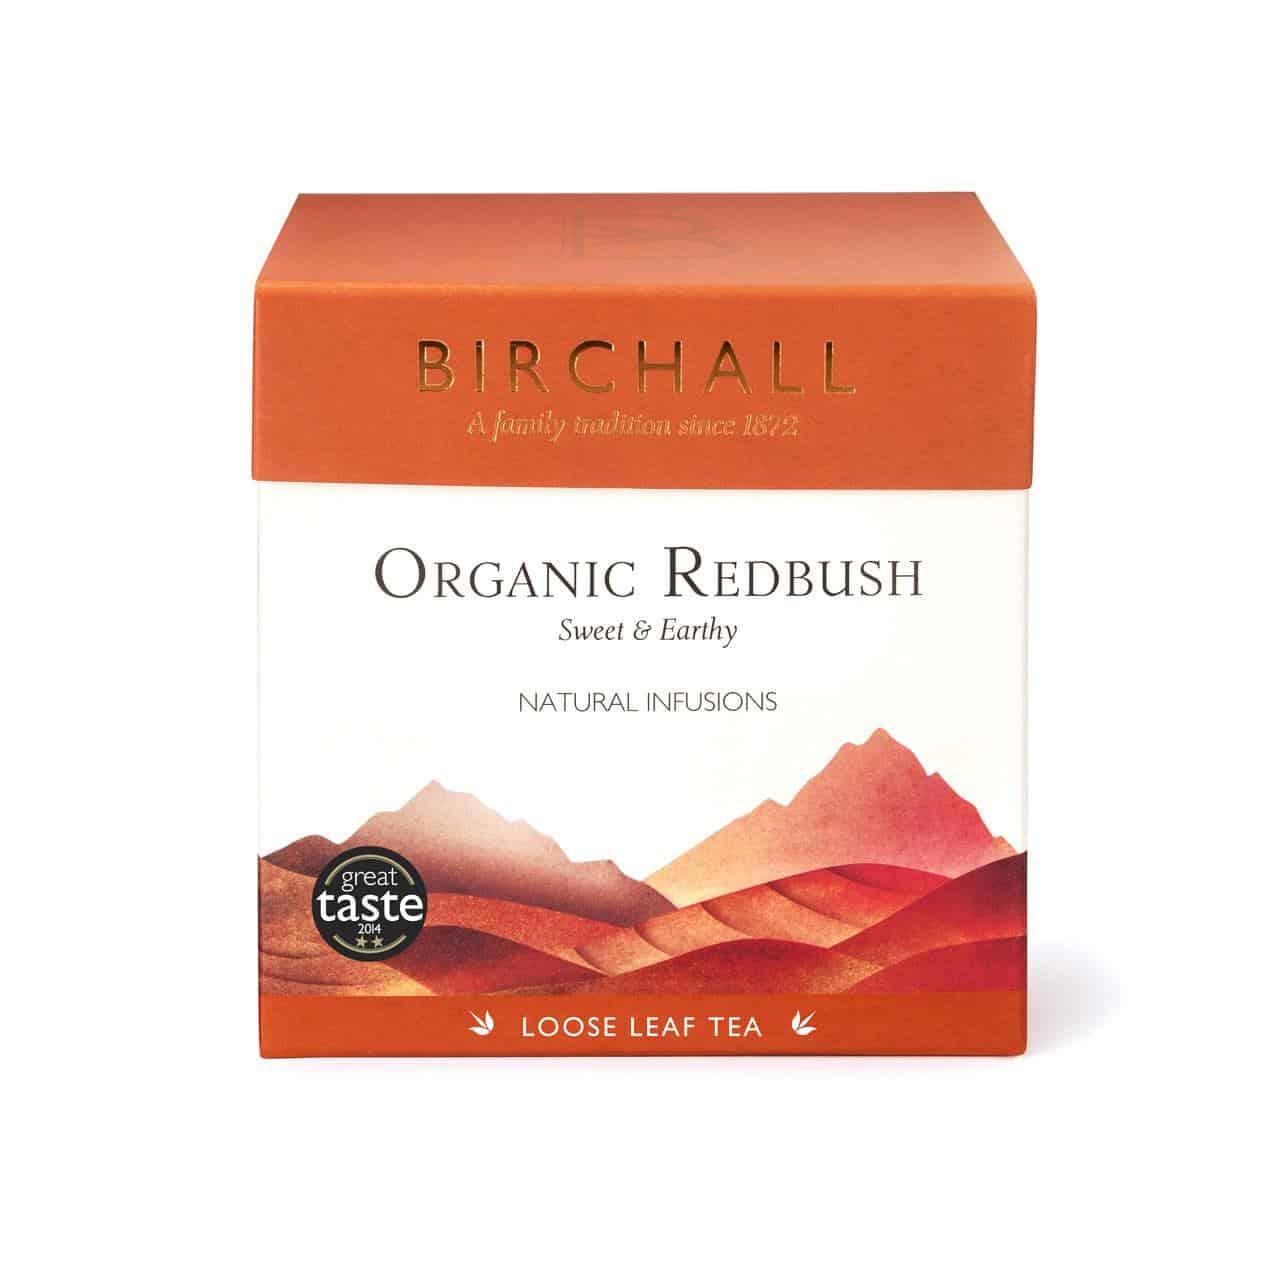 Birchall Organic Redbush - Loose Leaf Tea